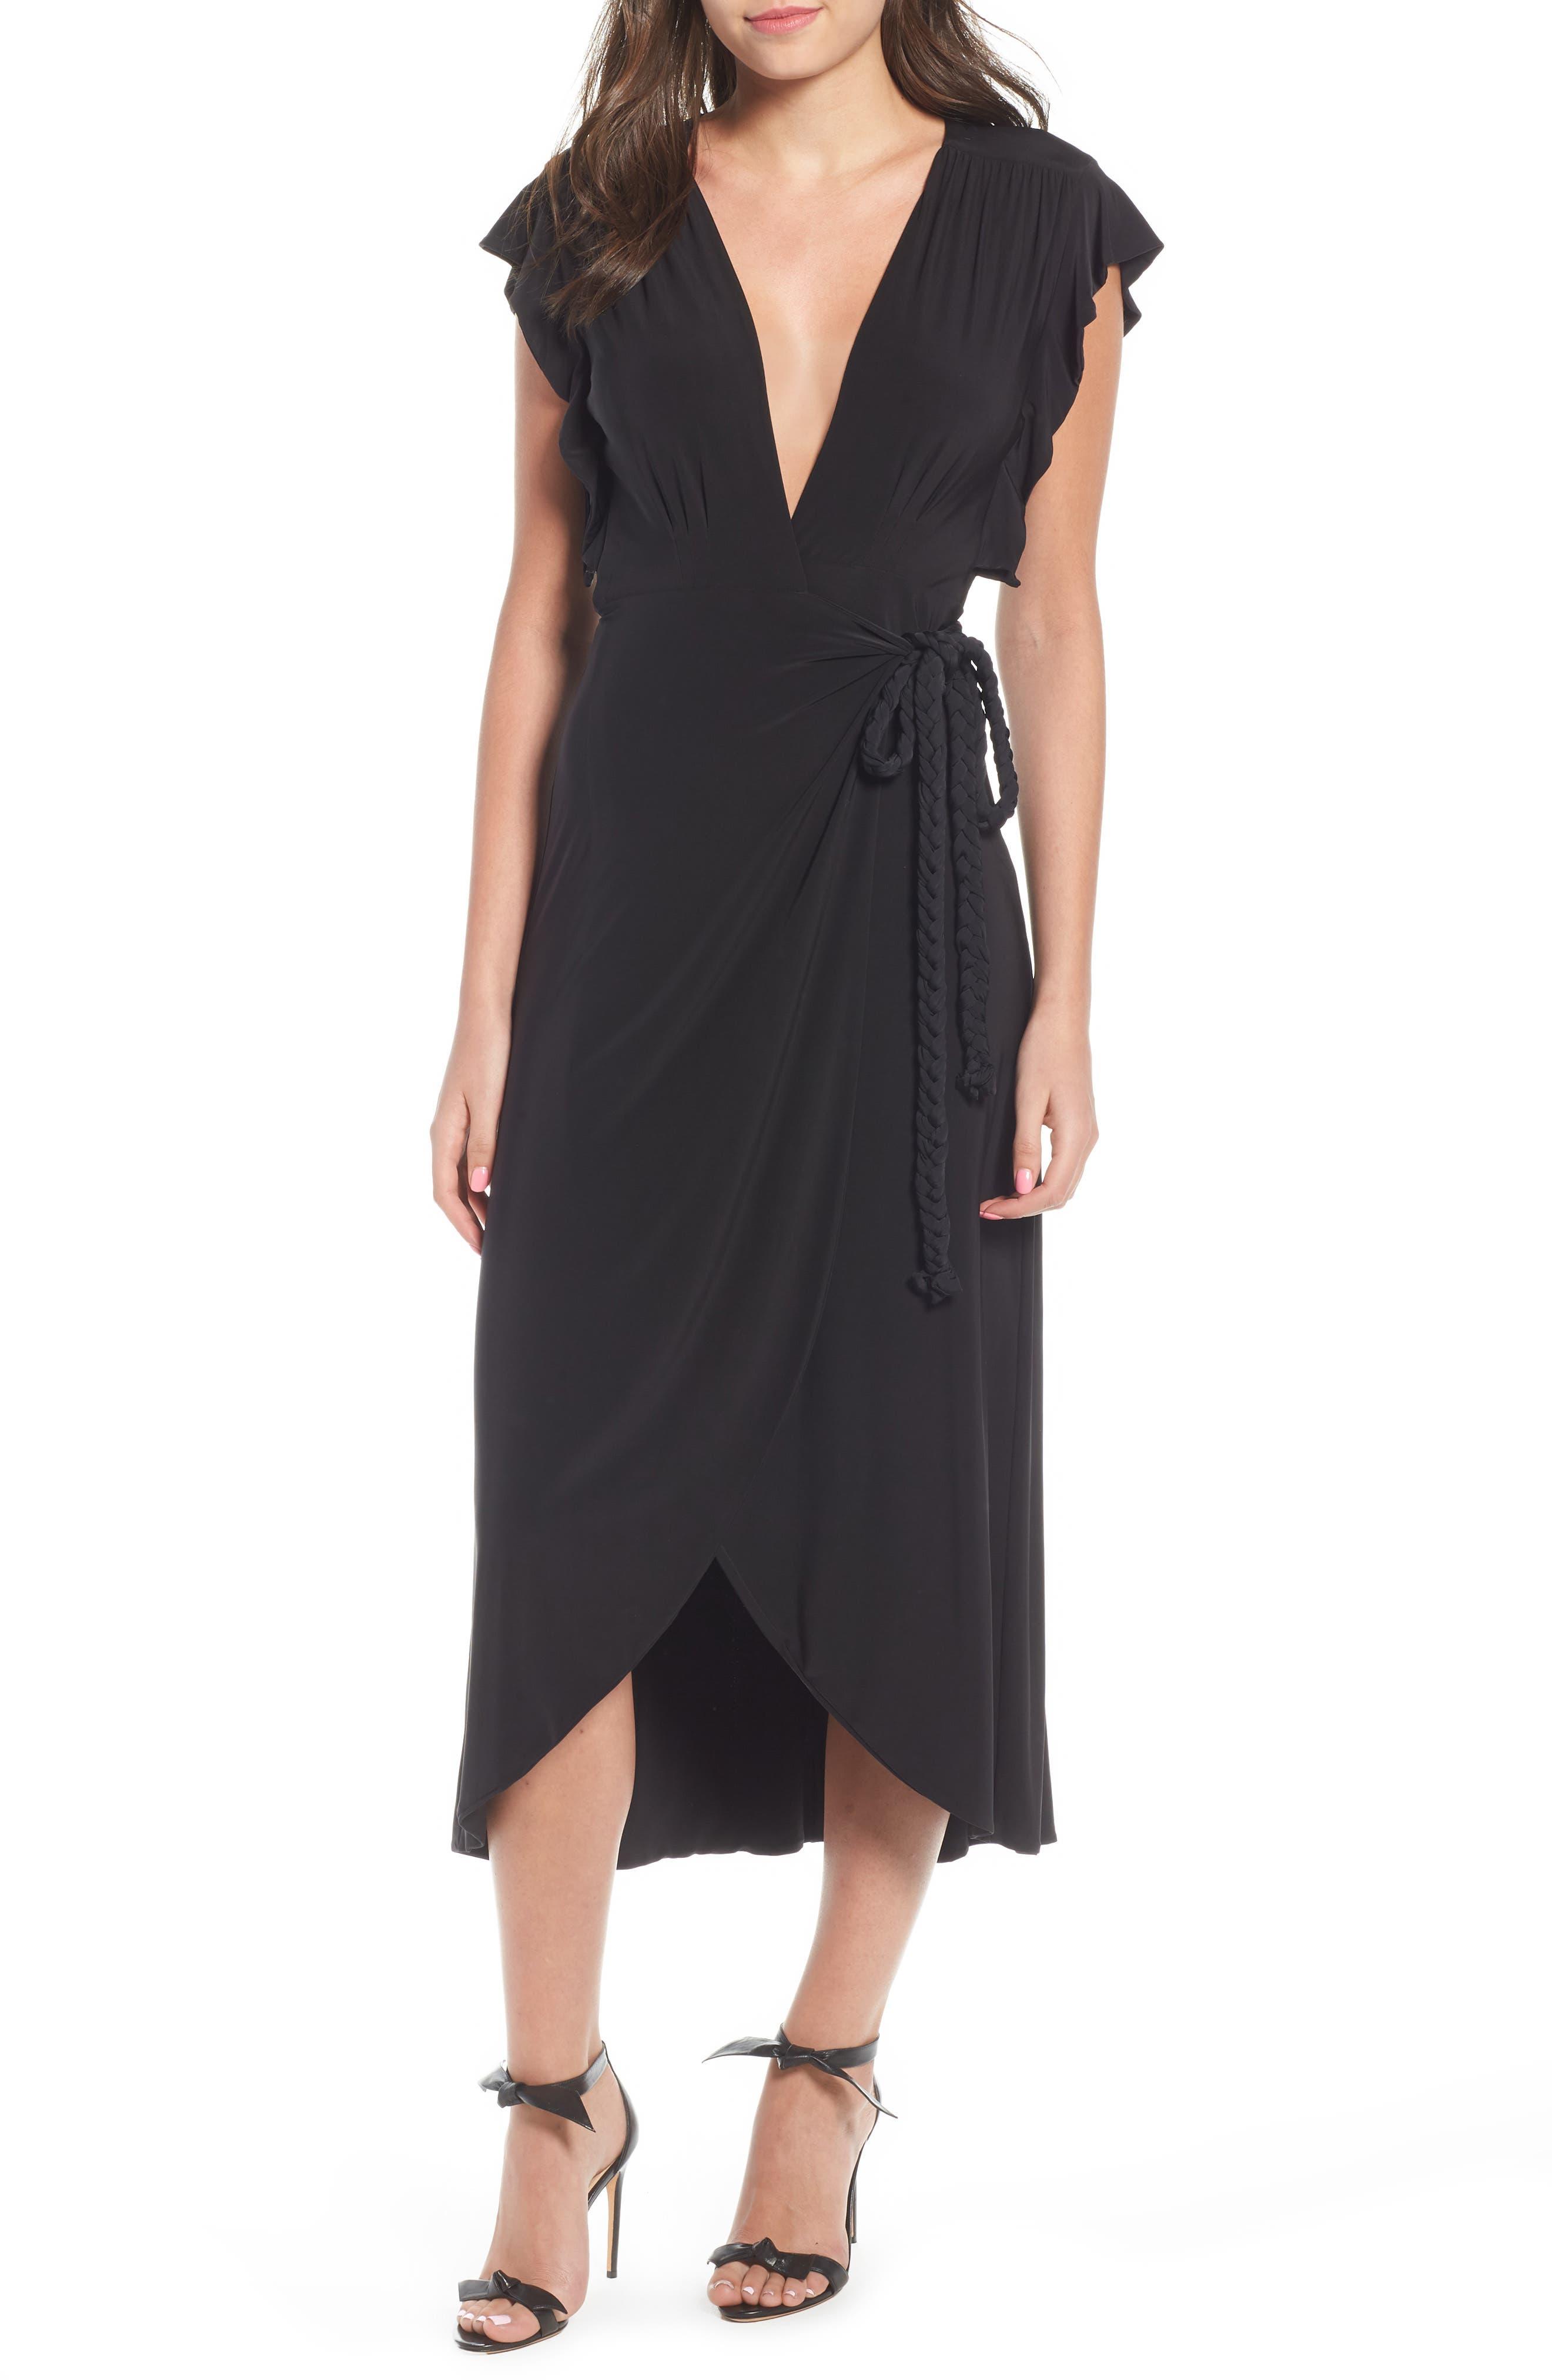 MISA LOS ANGELES Irina Dress, Main, color, 001